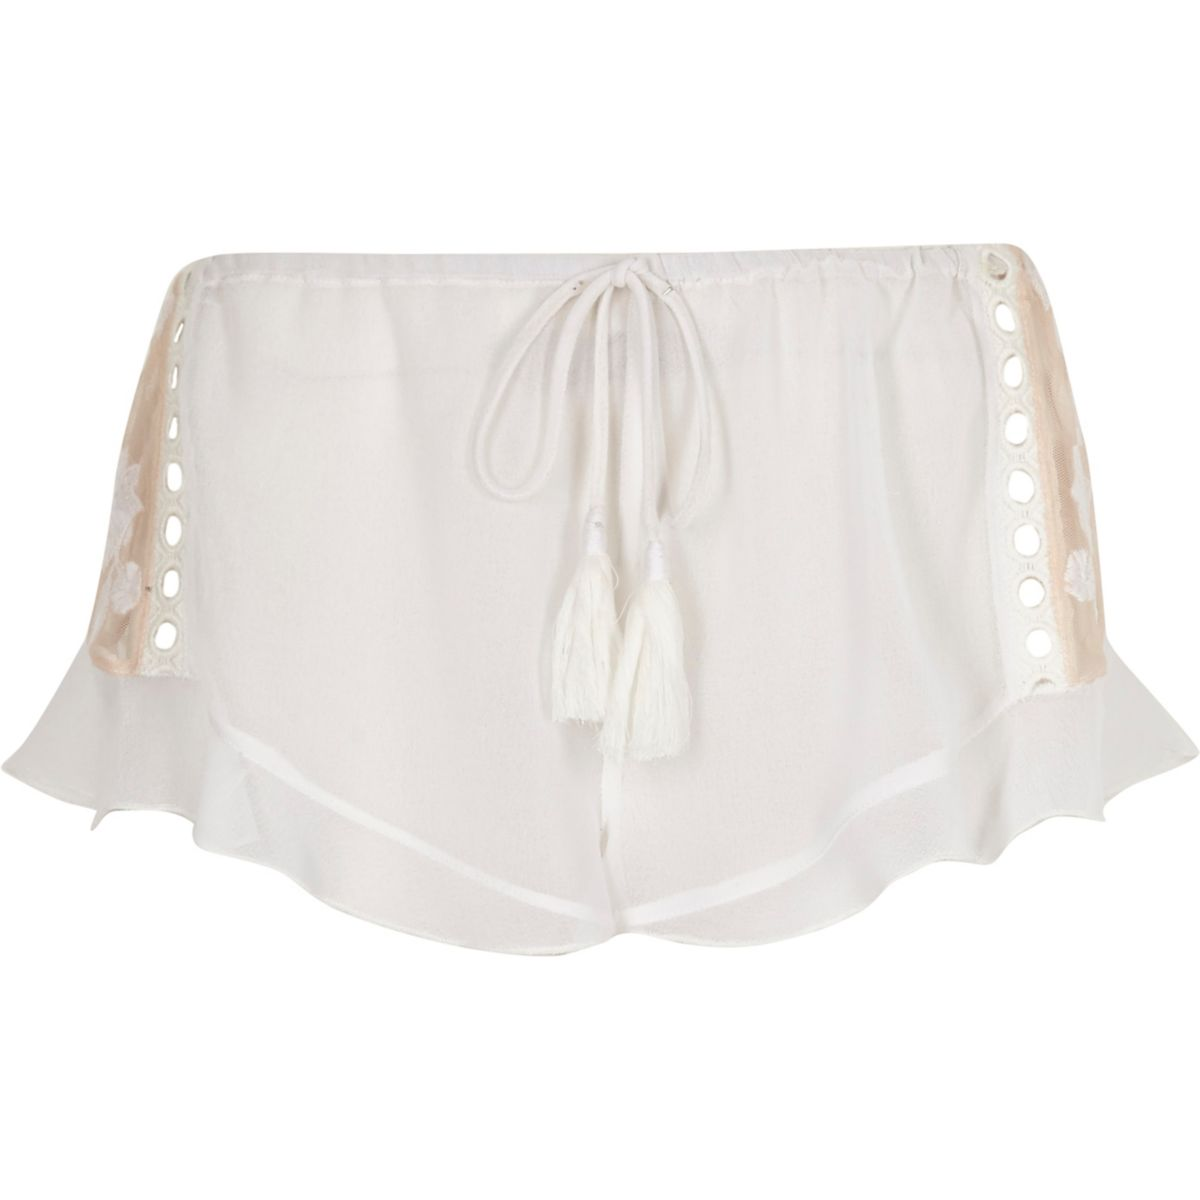 White sheer lace insert frill pajama shorts